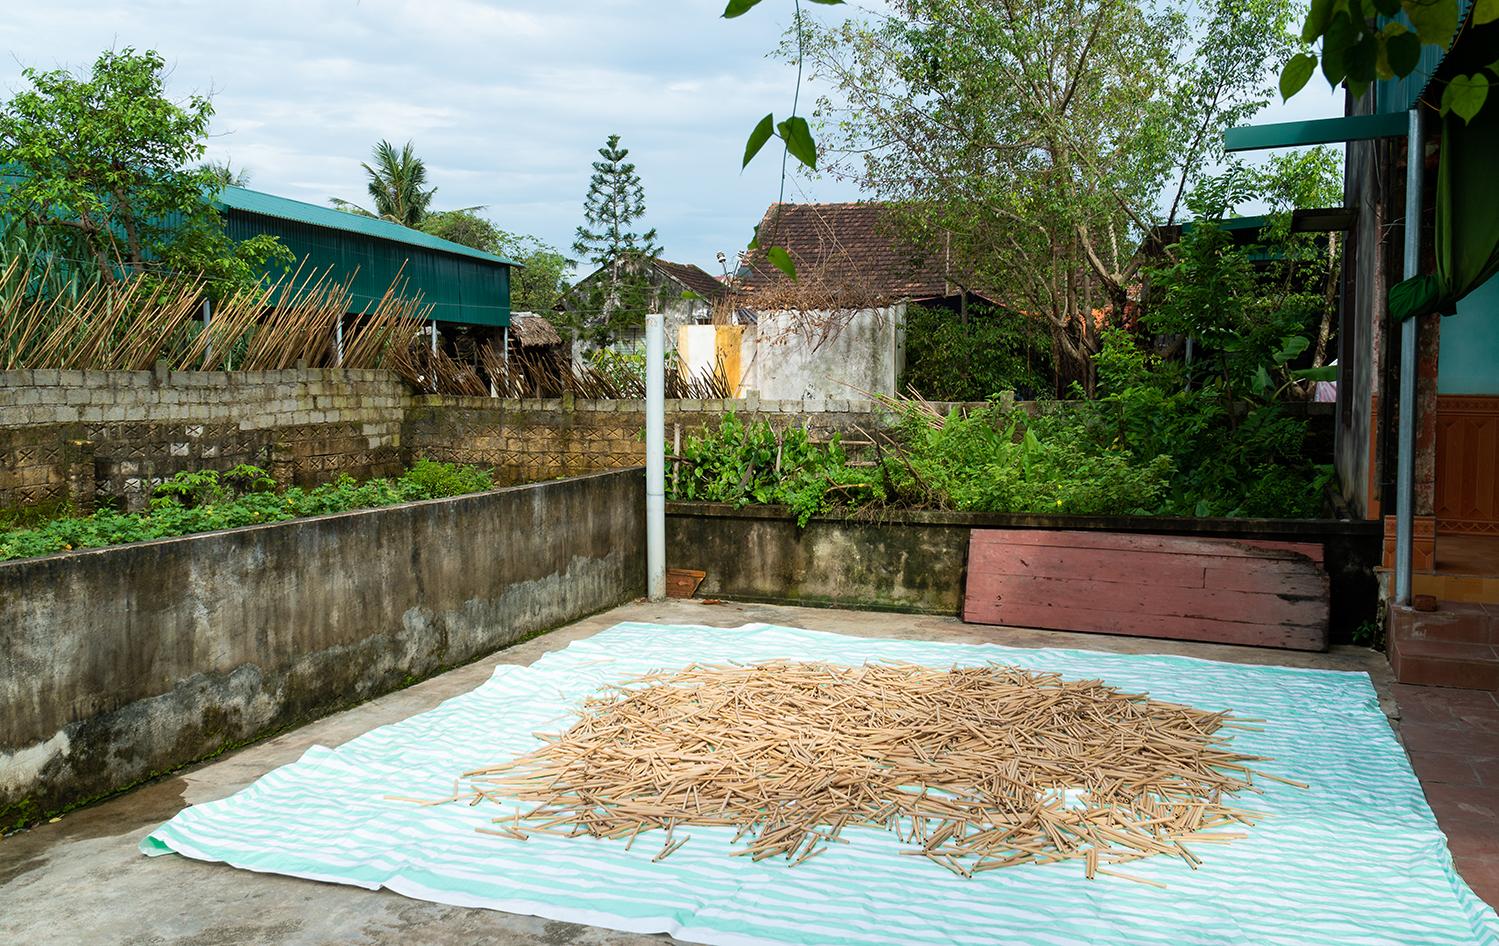 Bamboo-Straws-Drying-Outside-Jungle-Straw.jpg